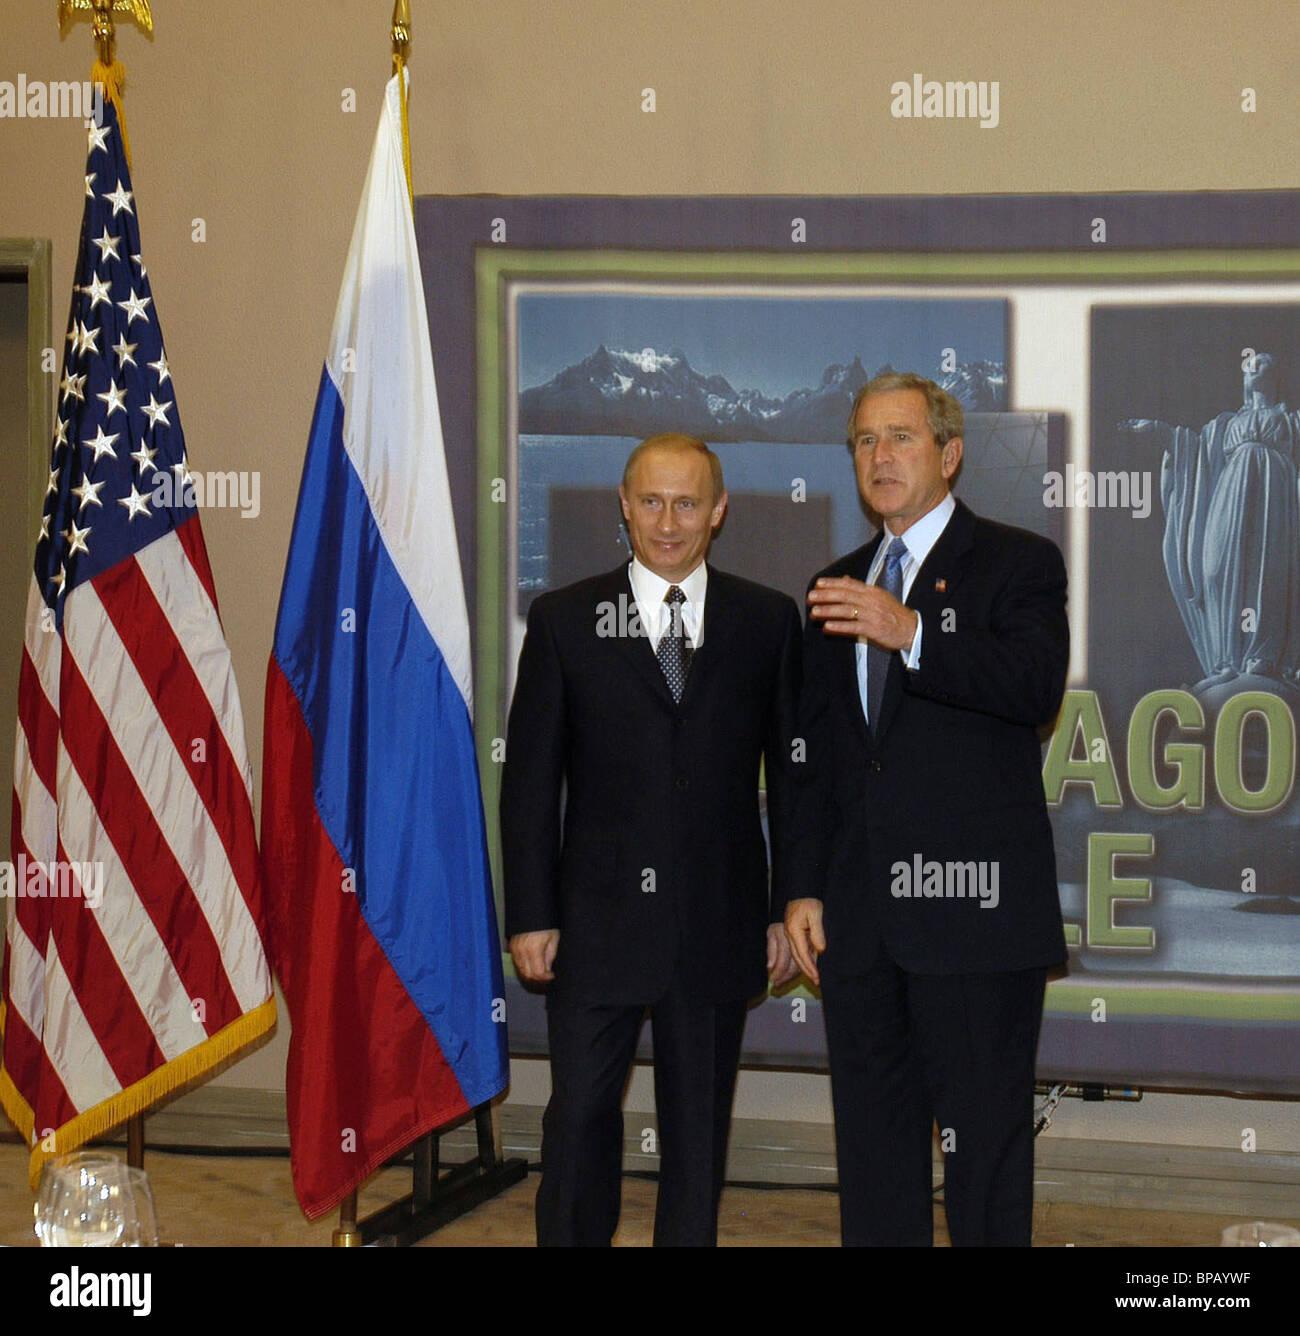 Putin, Bush discuss bilateral relations in Santiago - Stock Image